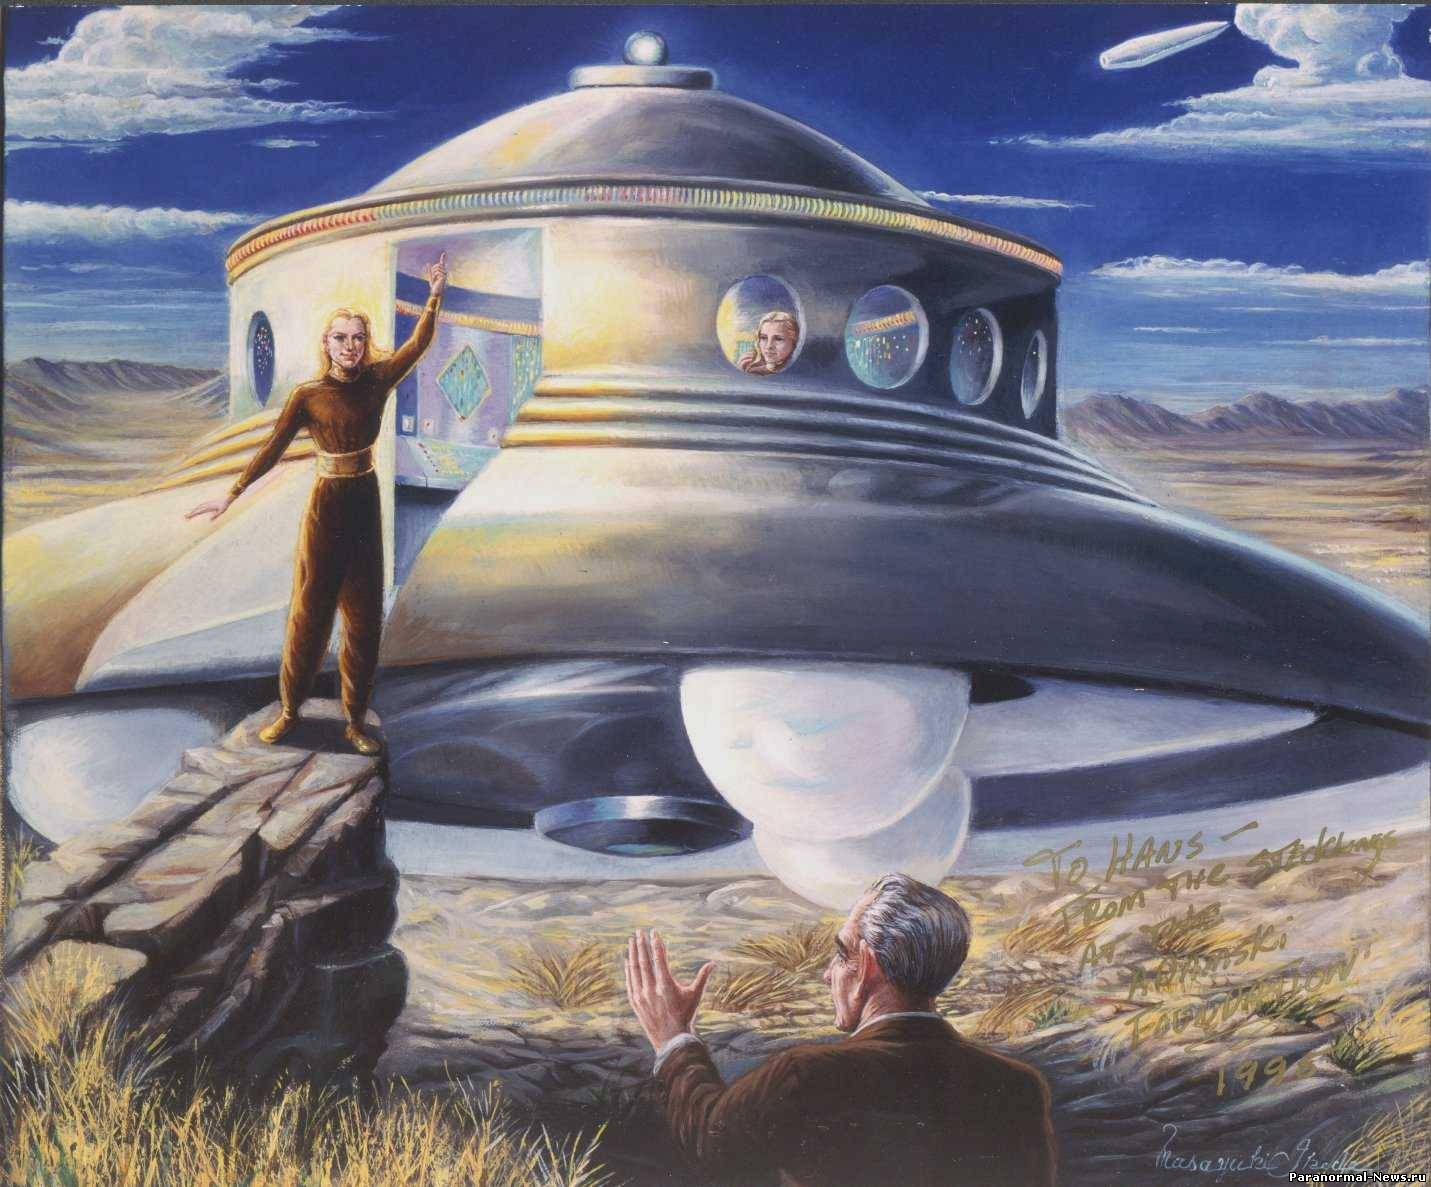 Ufo extraterrestrials piratebay nude movies